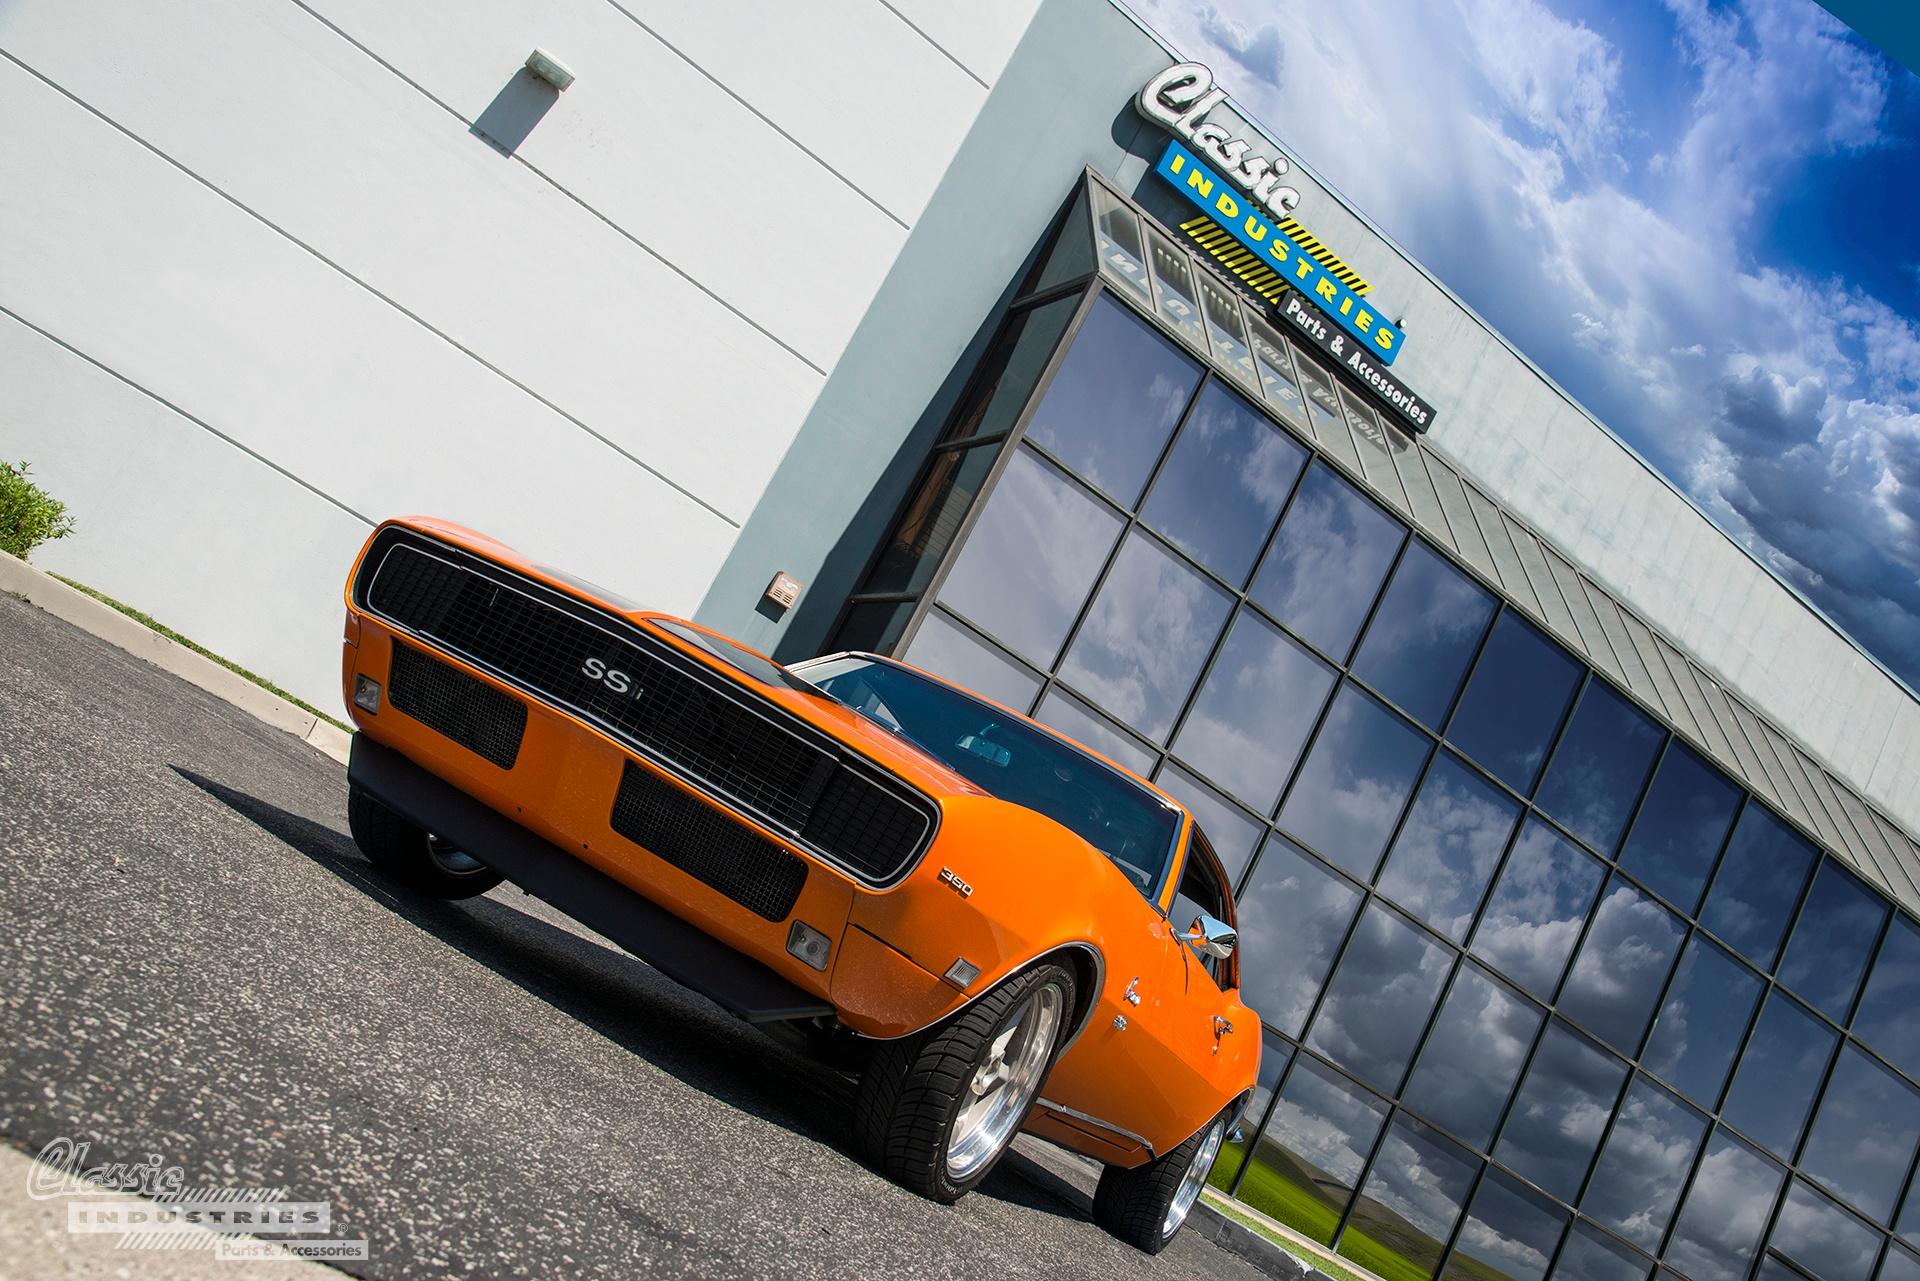 Pearl Orange 68 Camaro Building.jpg